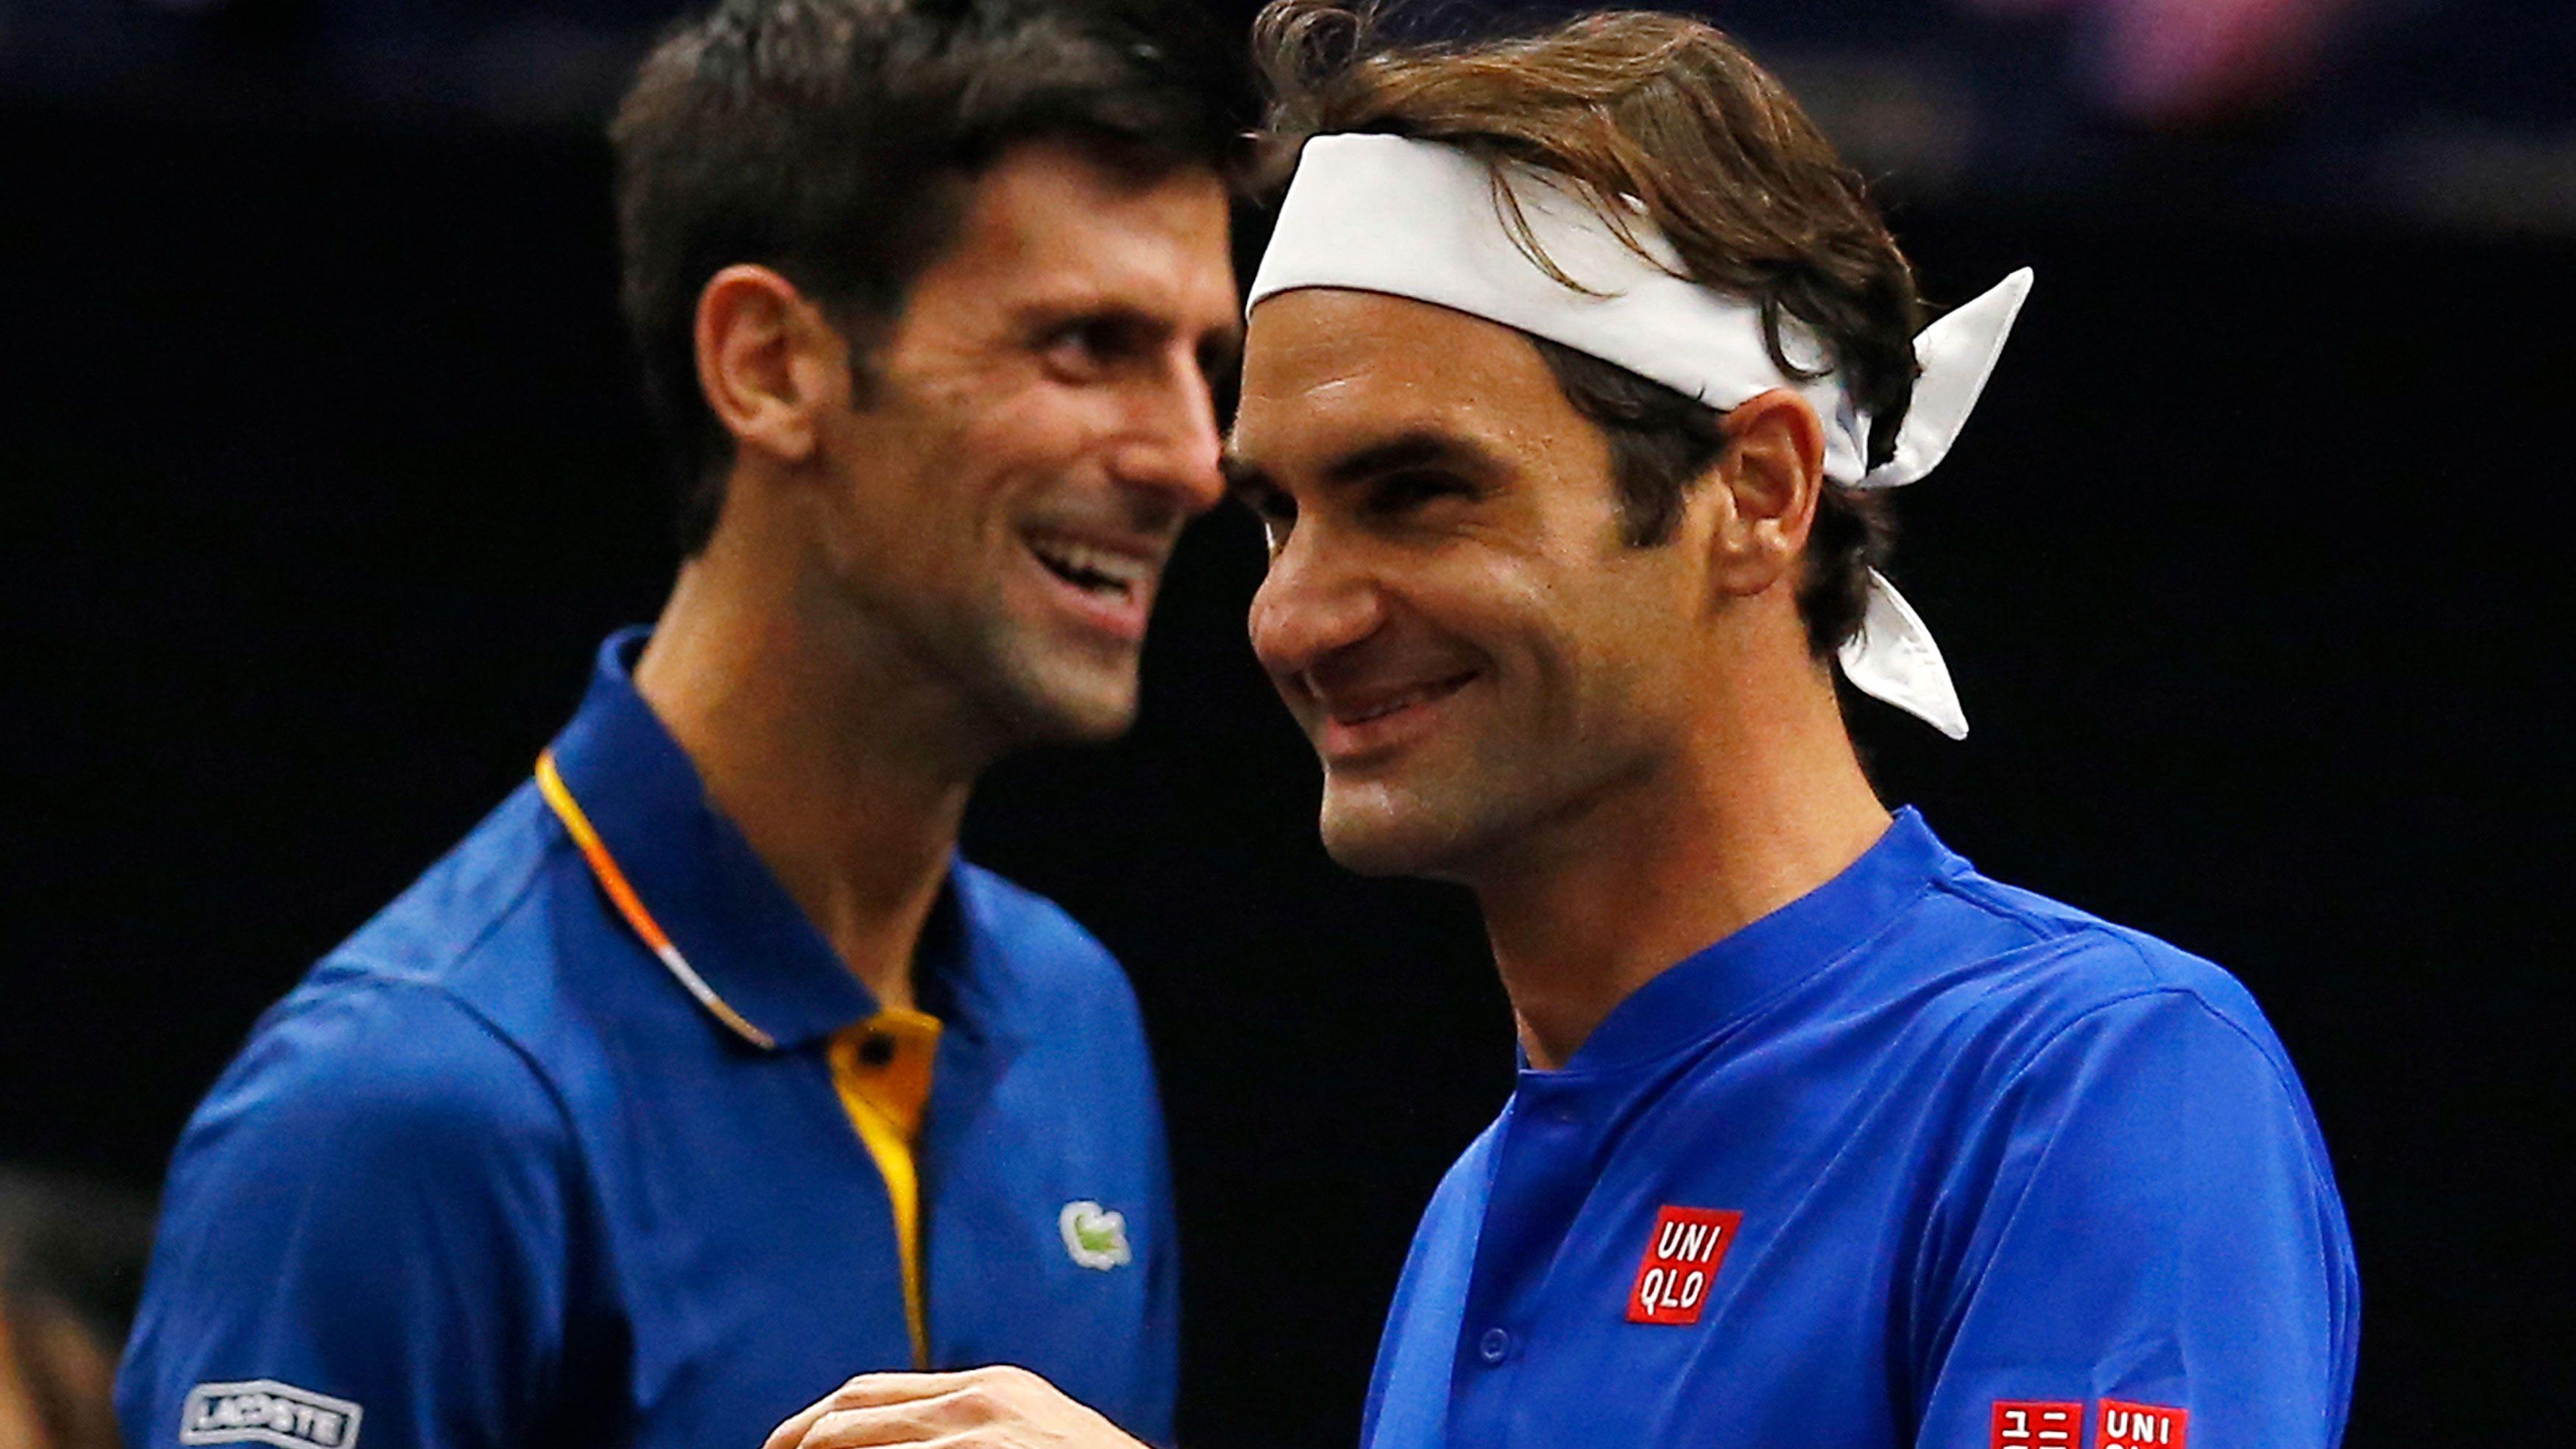 Superstars Roger Federer, Serena Williams confirmed headliners for Hopman Cup